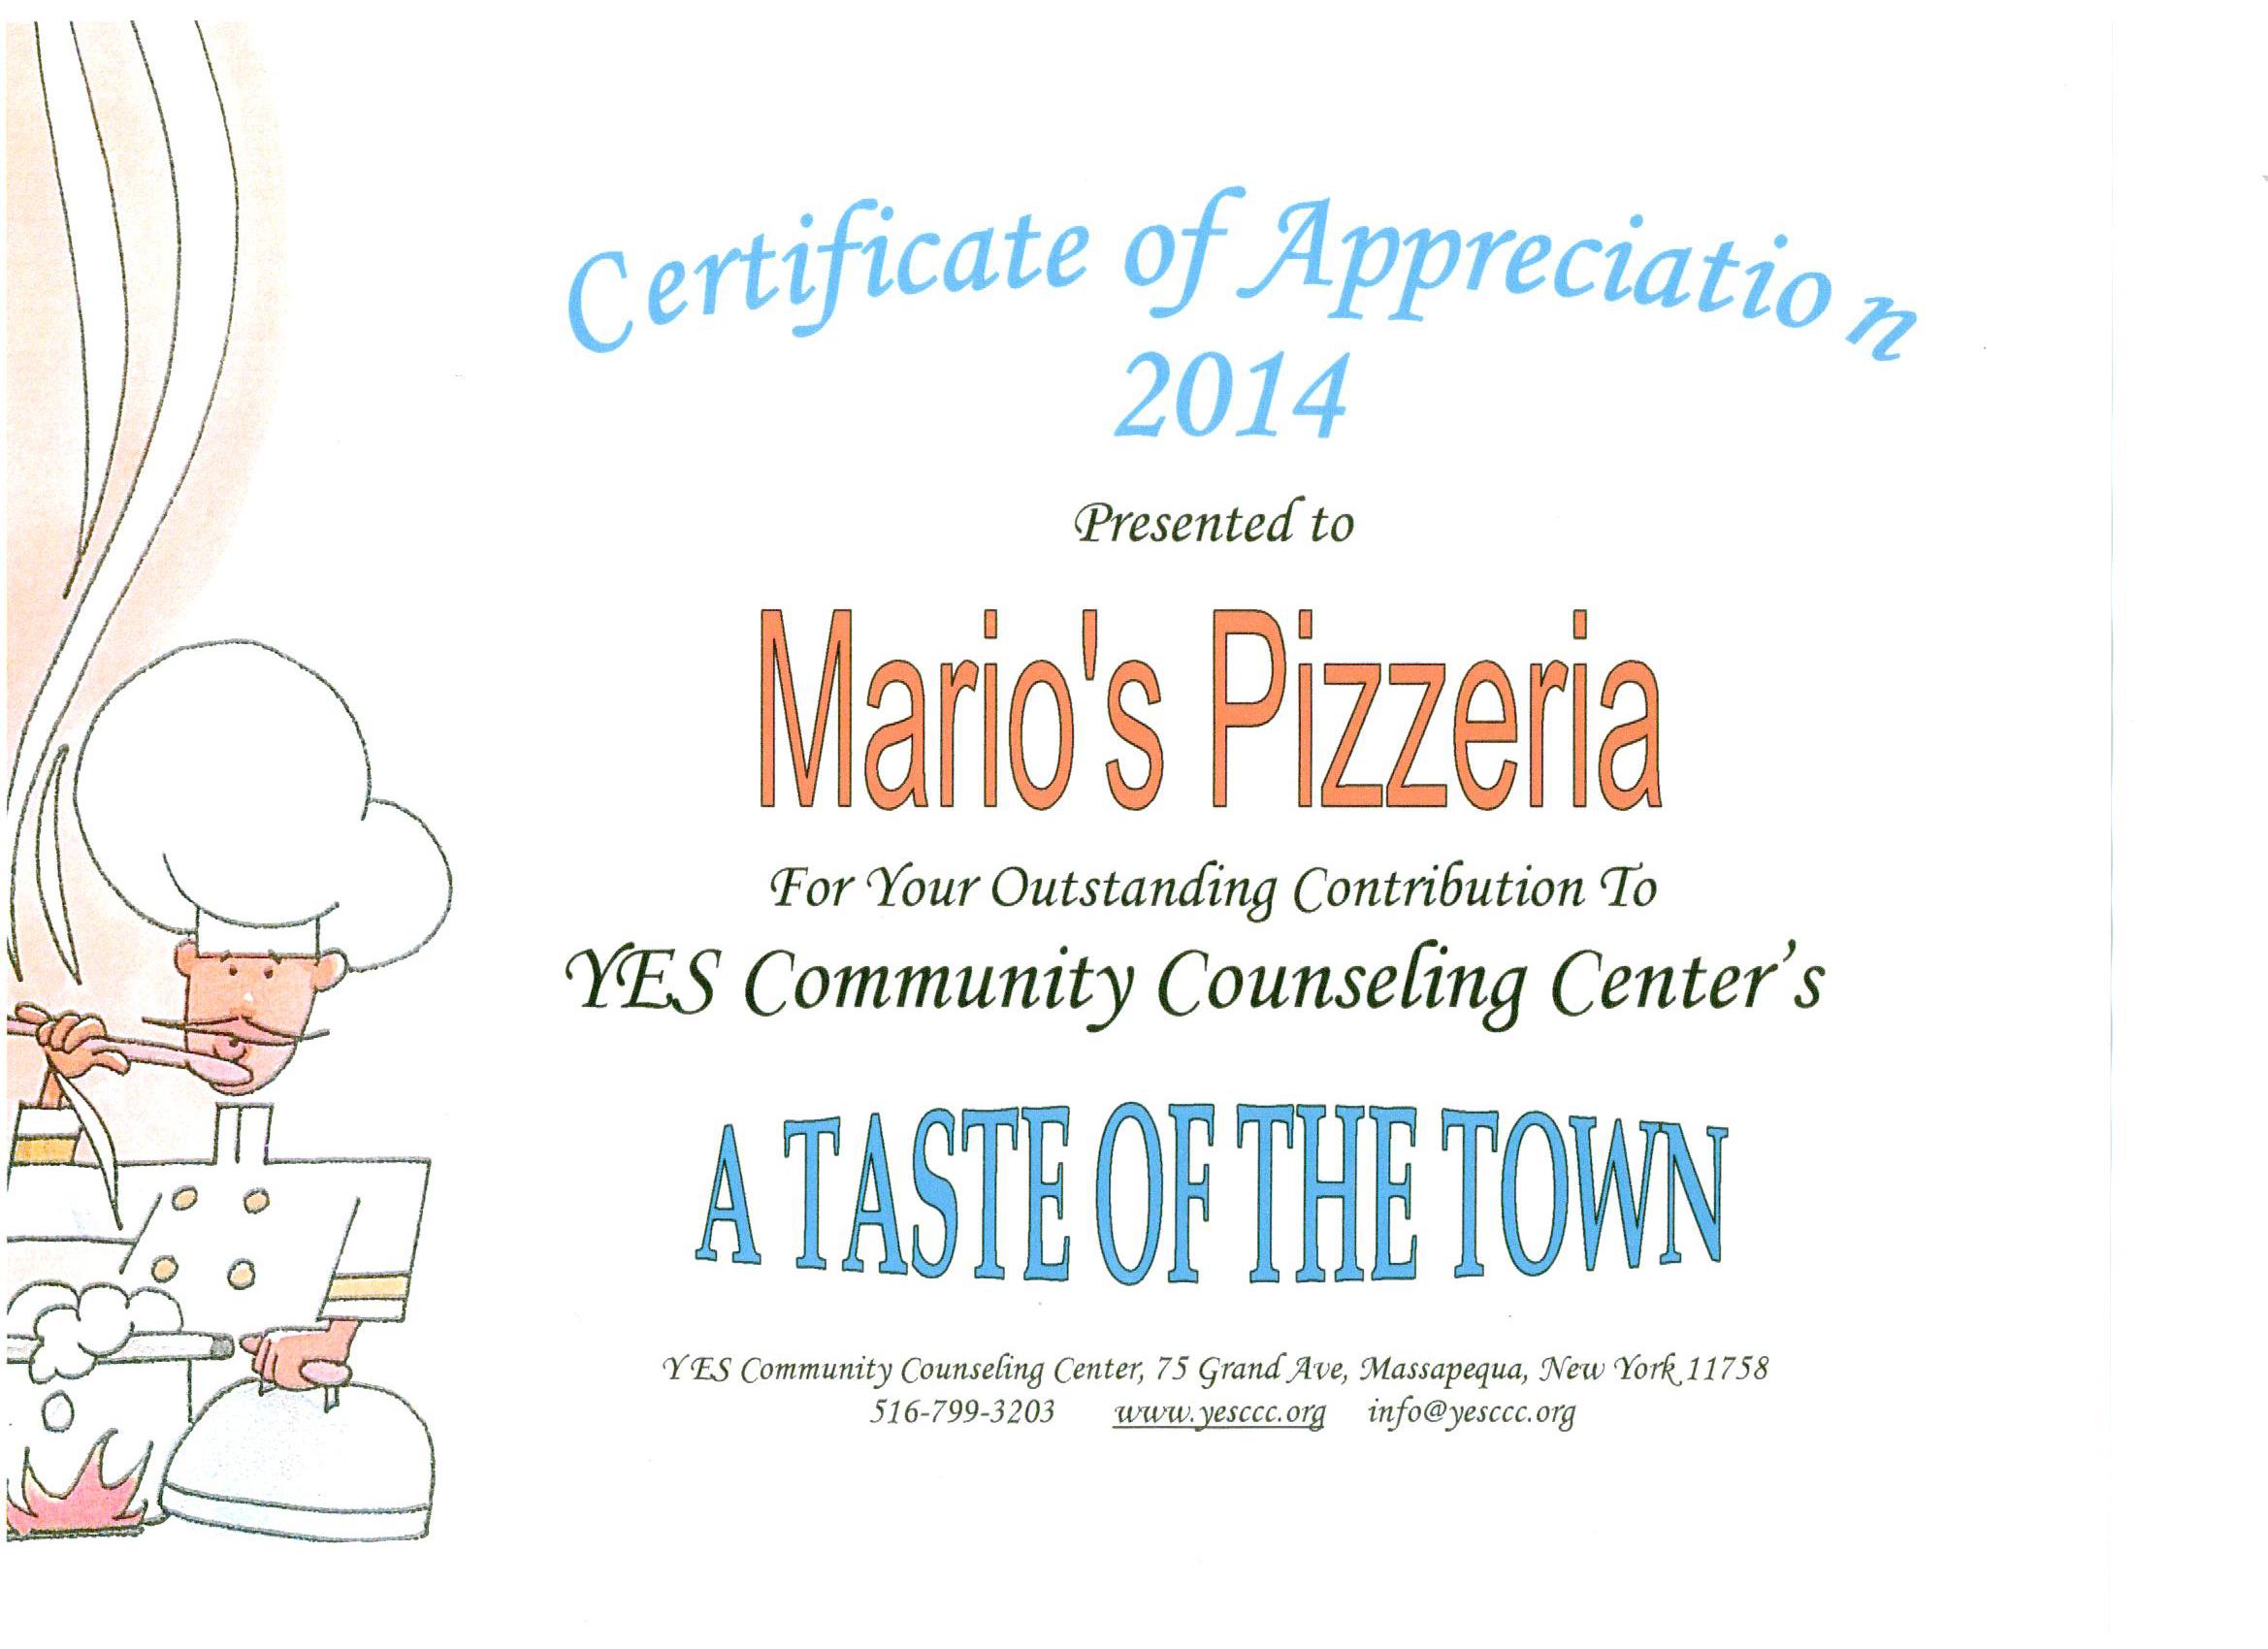 Italian Restaurants Reviews Nassau County Restaurant Ratings Massapequa Italian Food Long Island & Catering Long Island